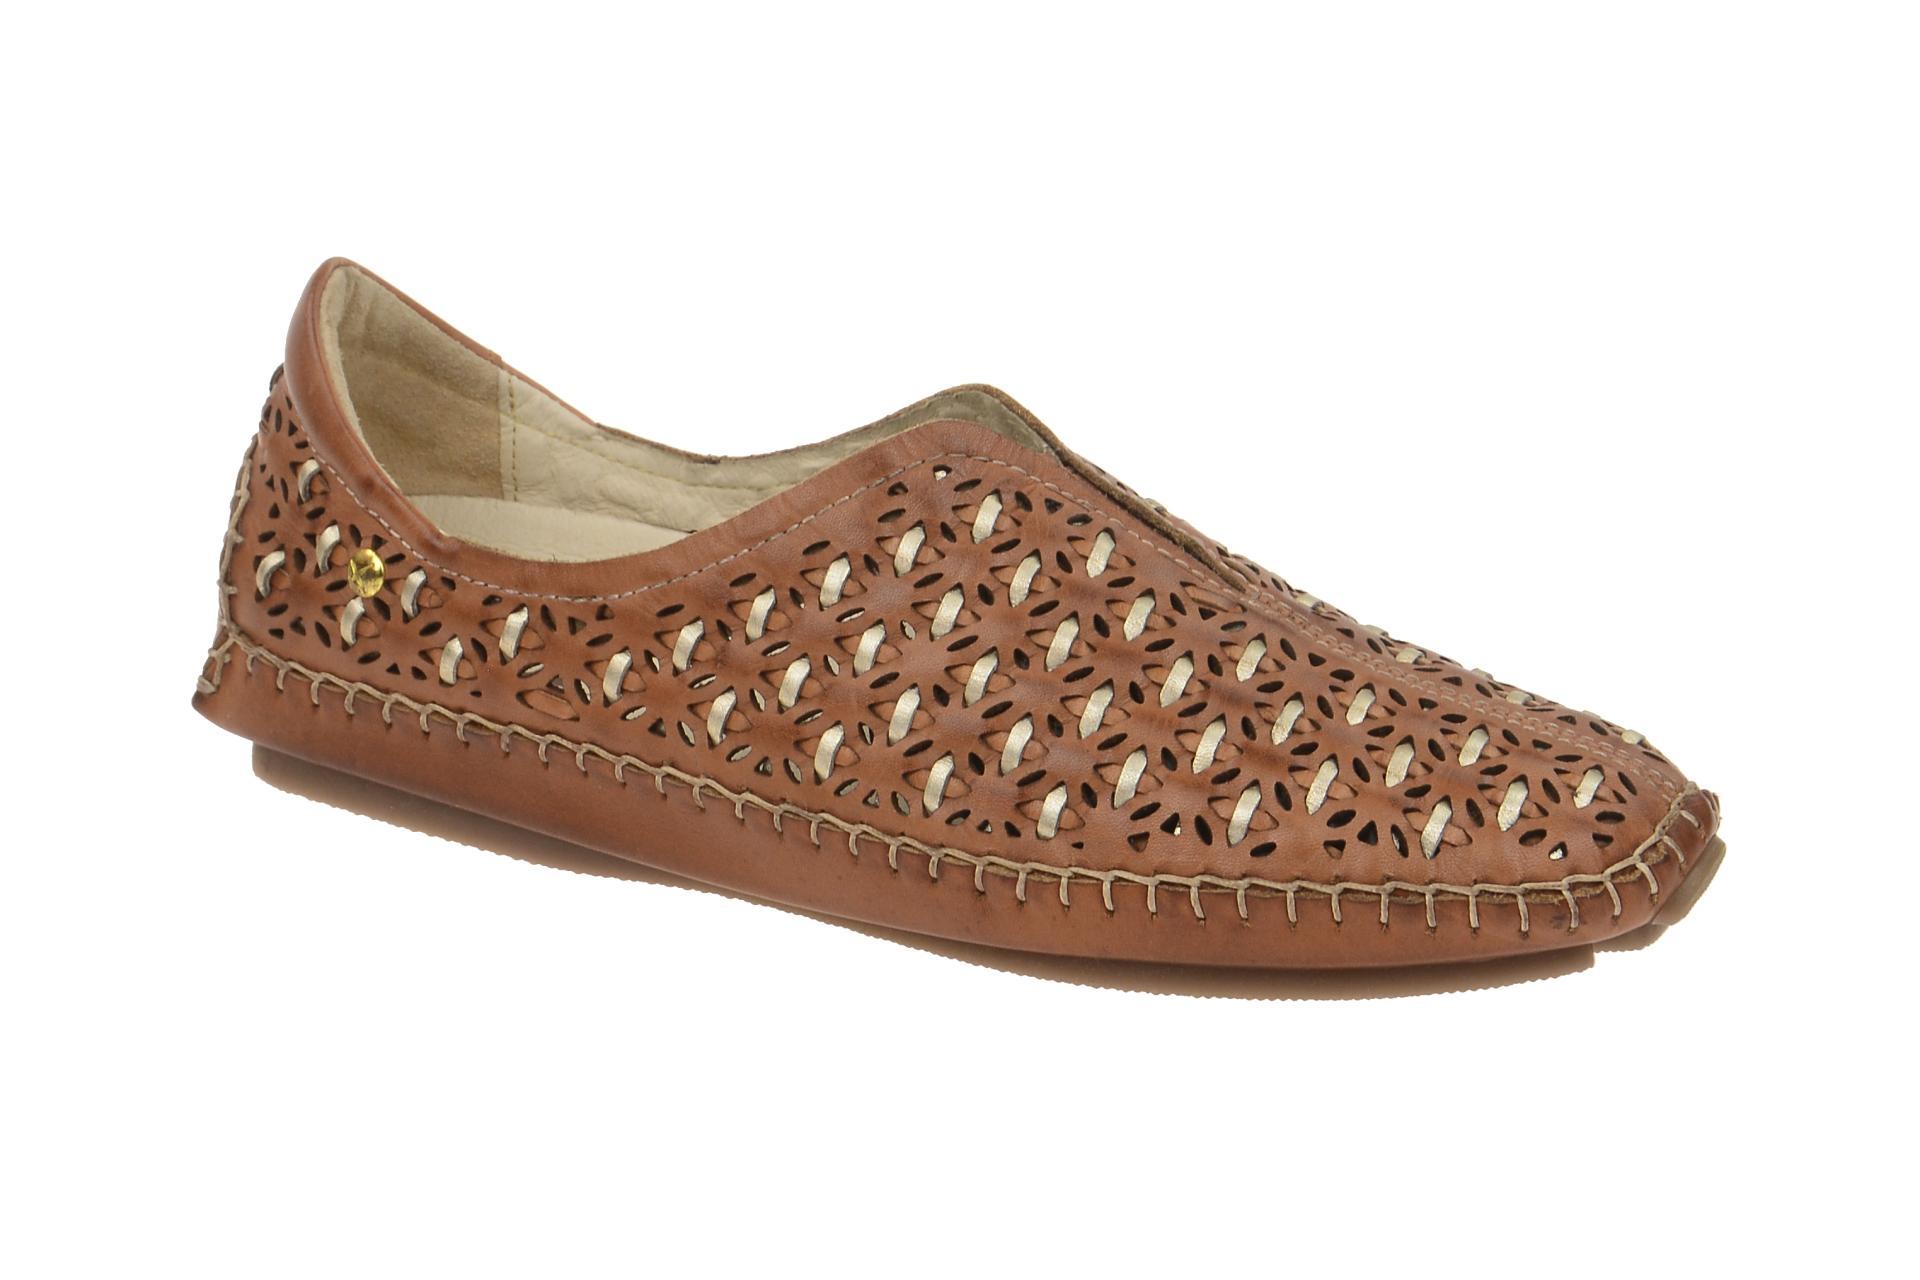 Pikolinos Chaussures Jerez Marron Femmes Chaussures confortables pantoufles 578-3509c1 Brandy Neuf